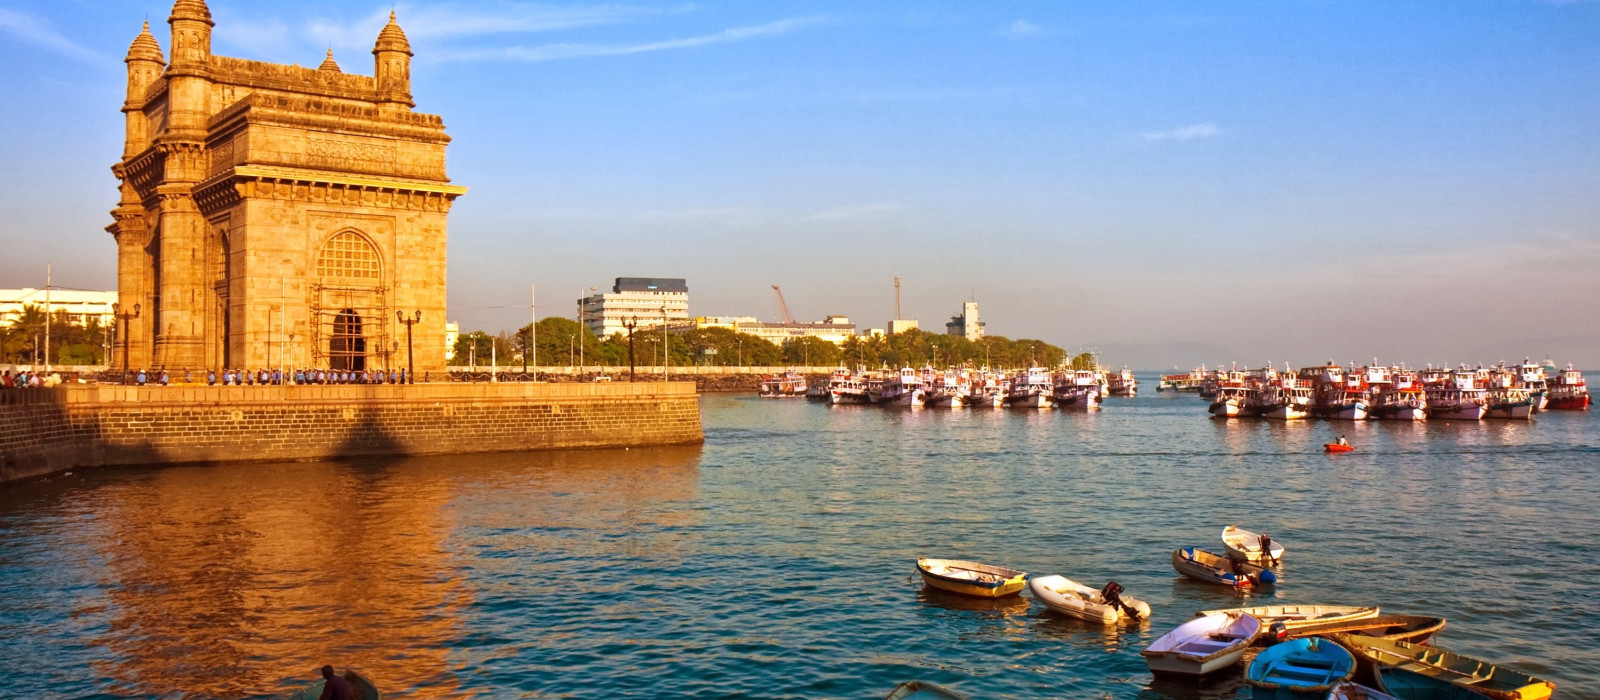 Hotel Deccan Odyssey Zentral- & Westindien